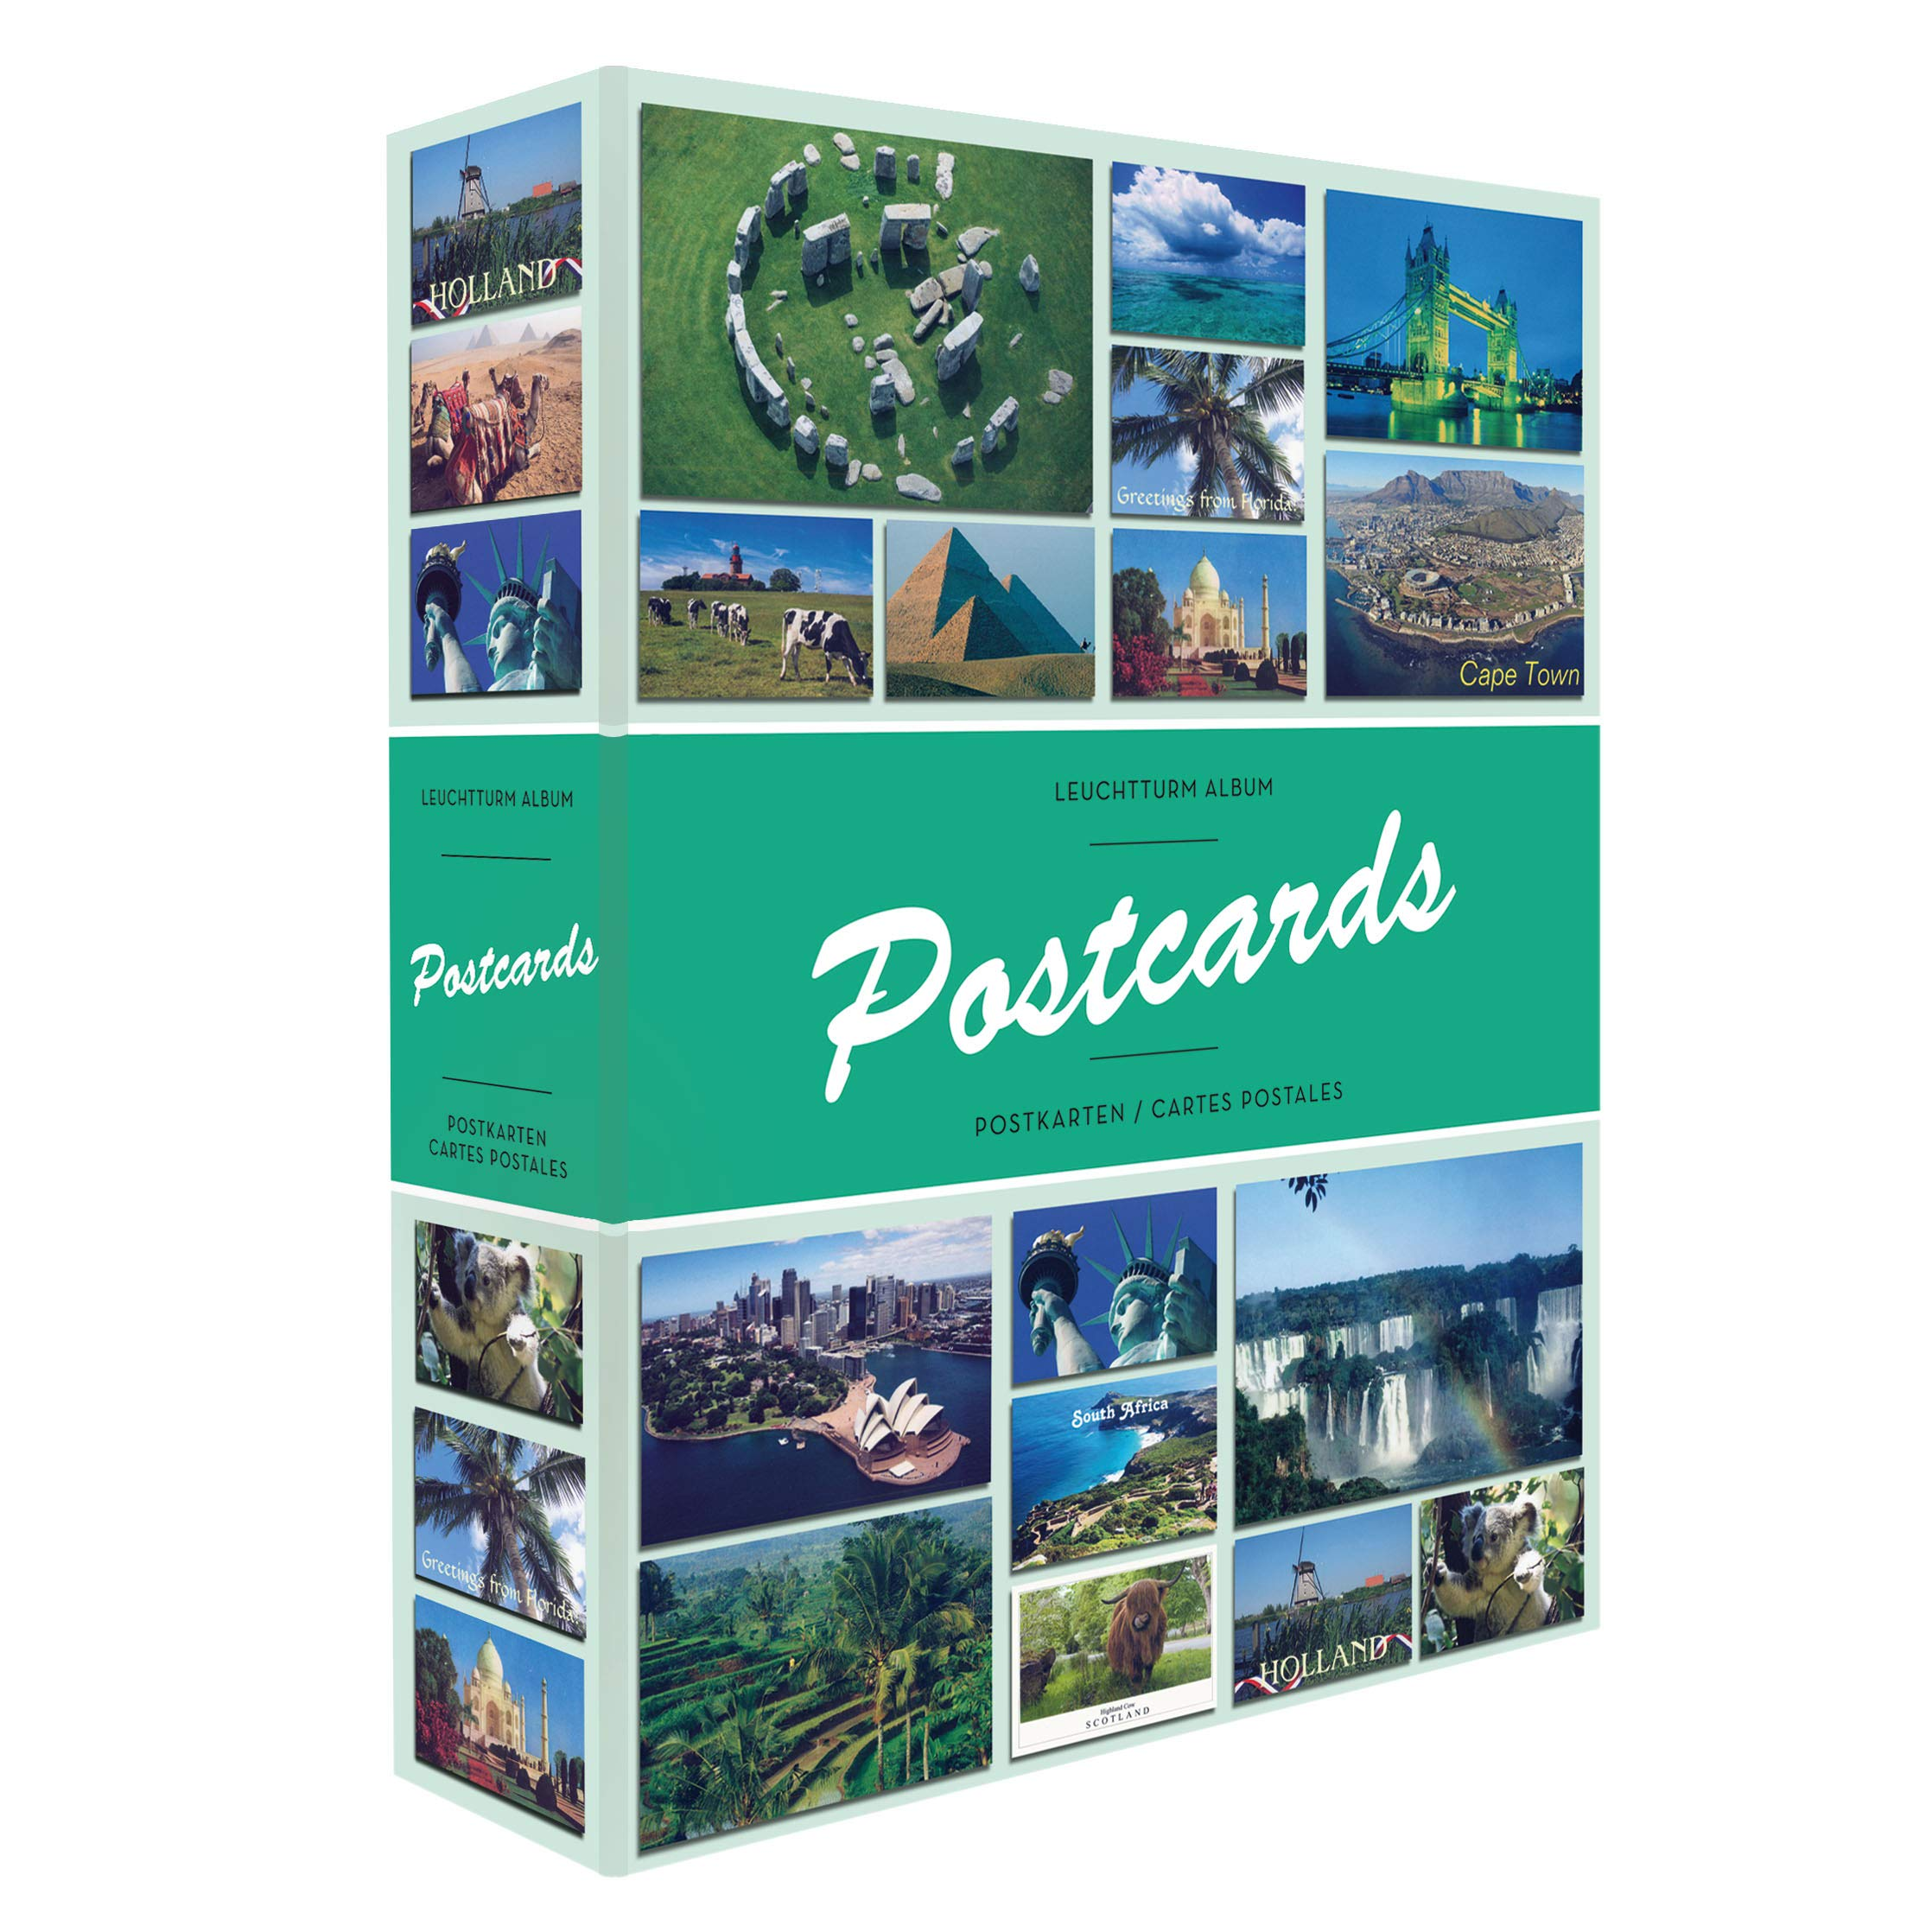 LEUCHTTURM1917 Album Postcards for 200 Postcards, with 50 Bound Sheets